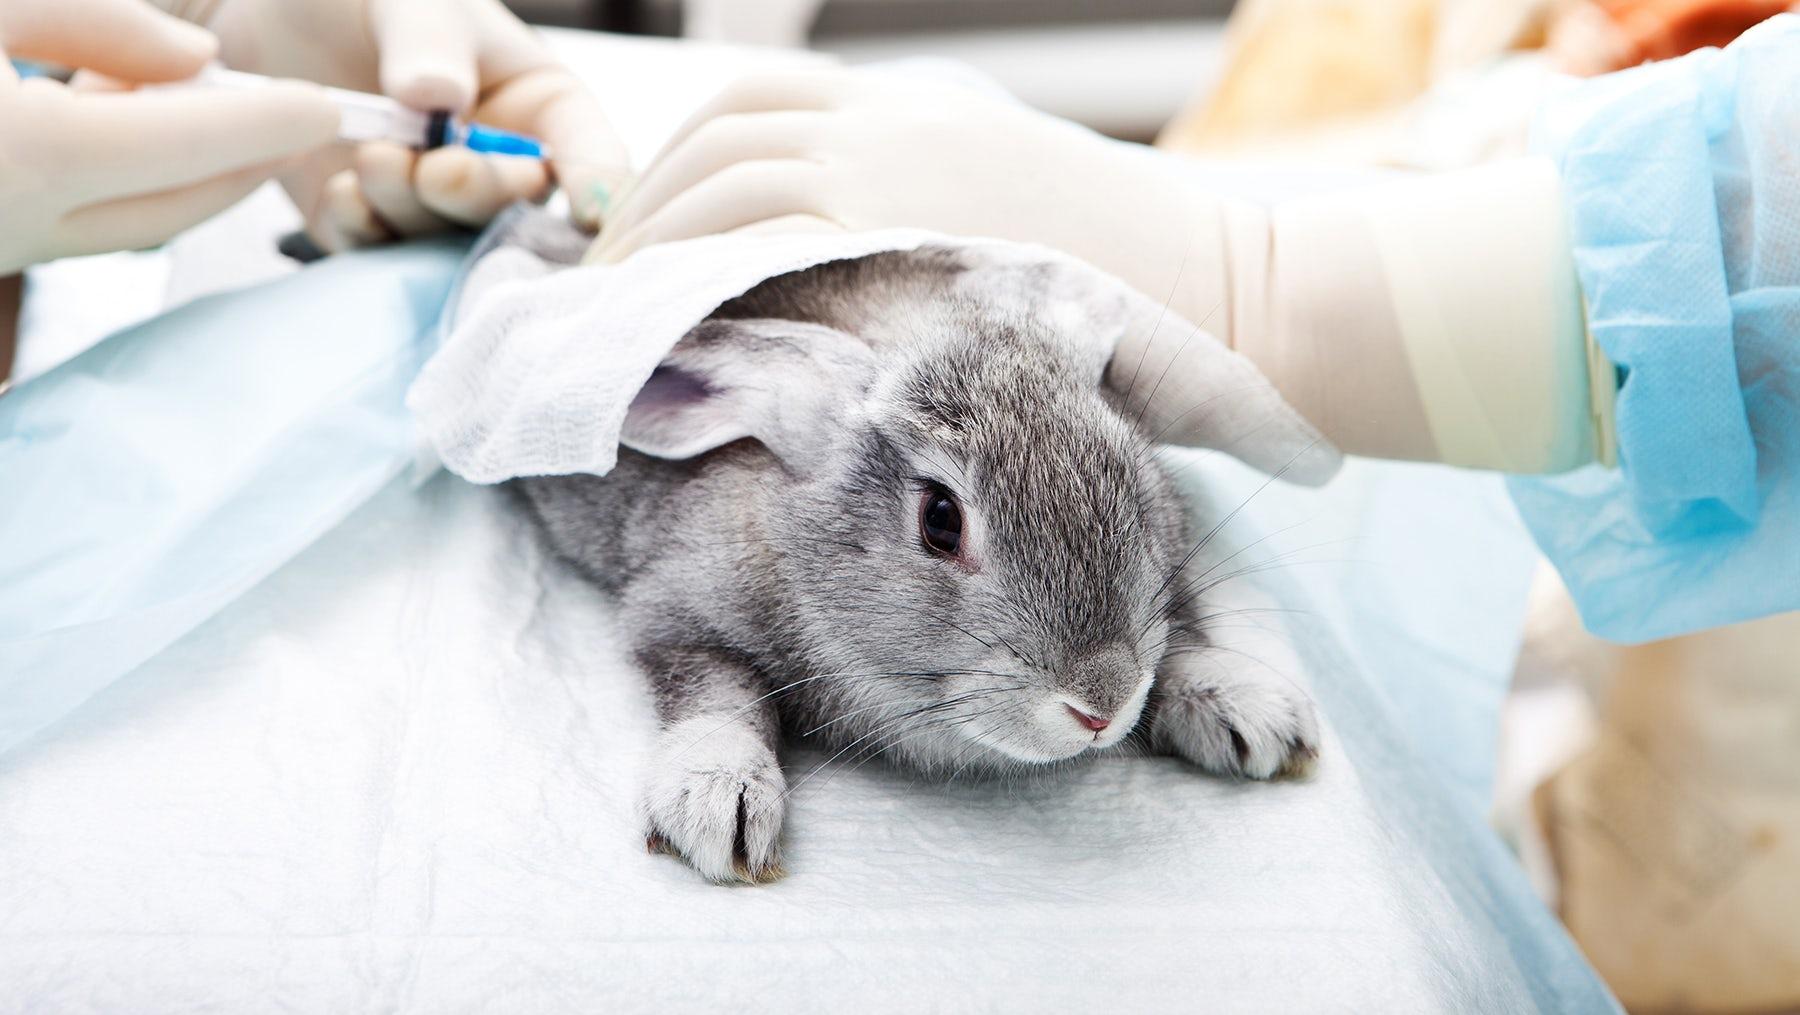 Cosmetics animal testing   Source: Shutterstock